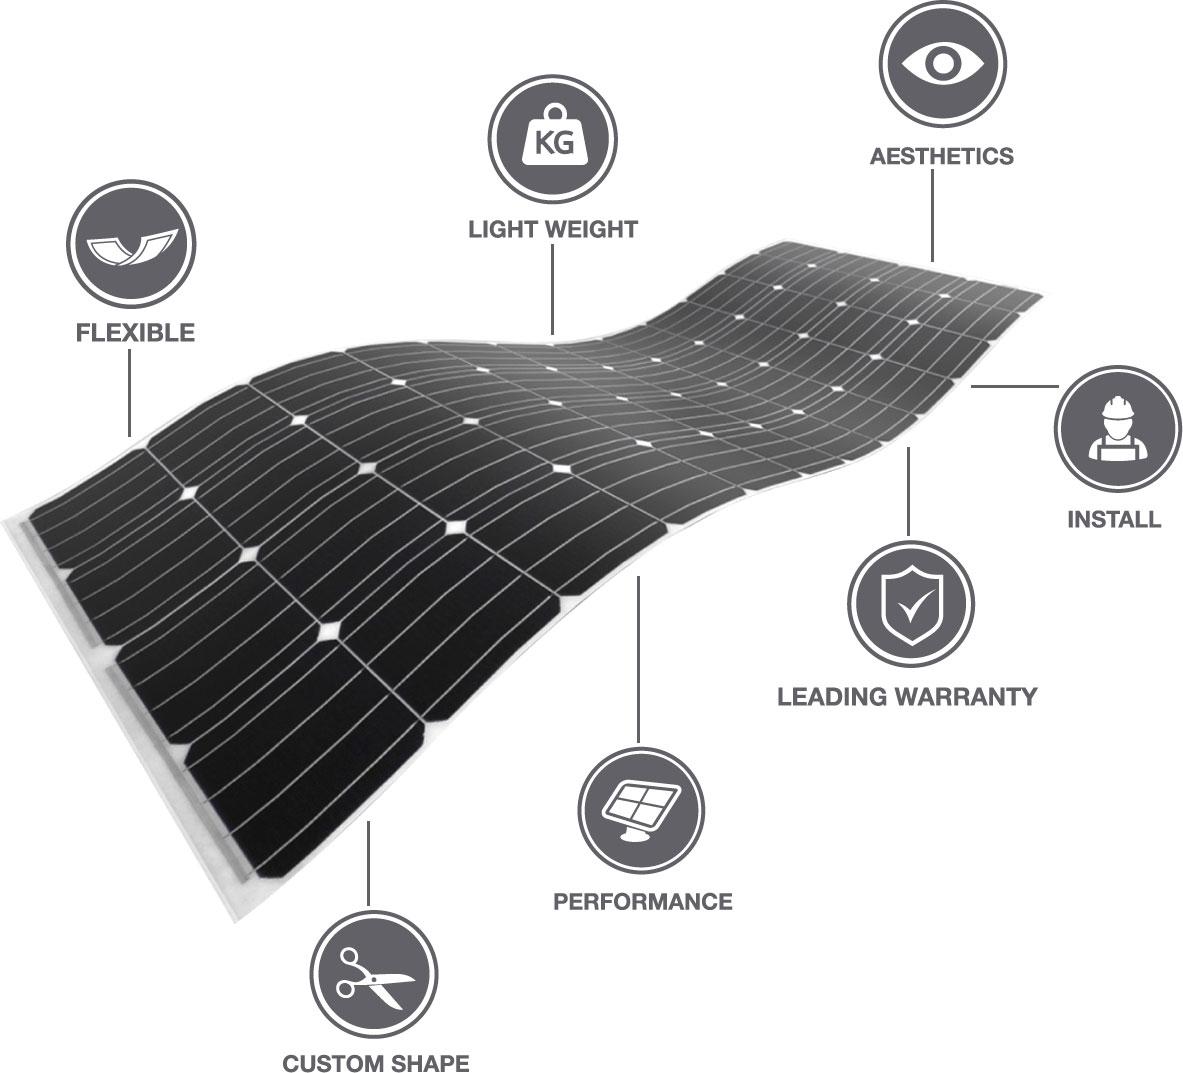 Earche Energus Solar Panels Sydney